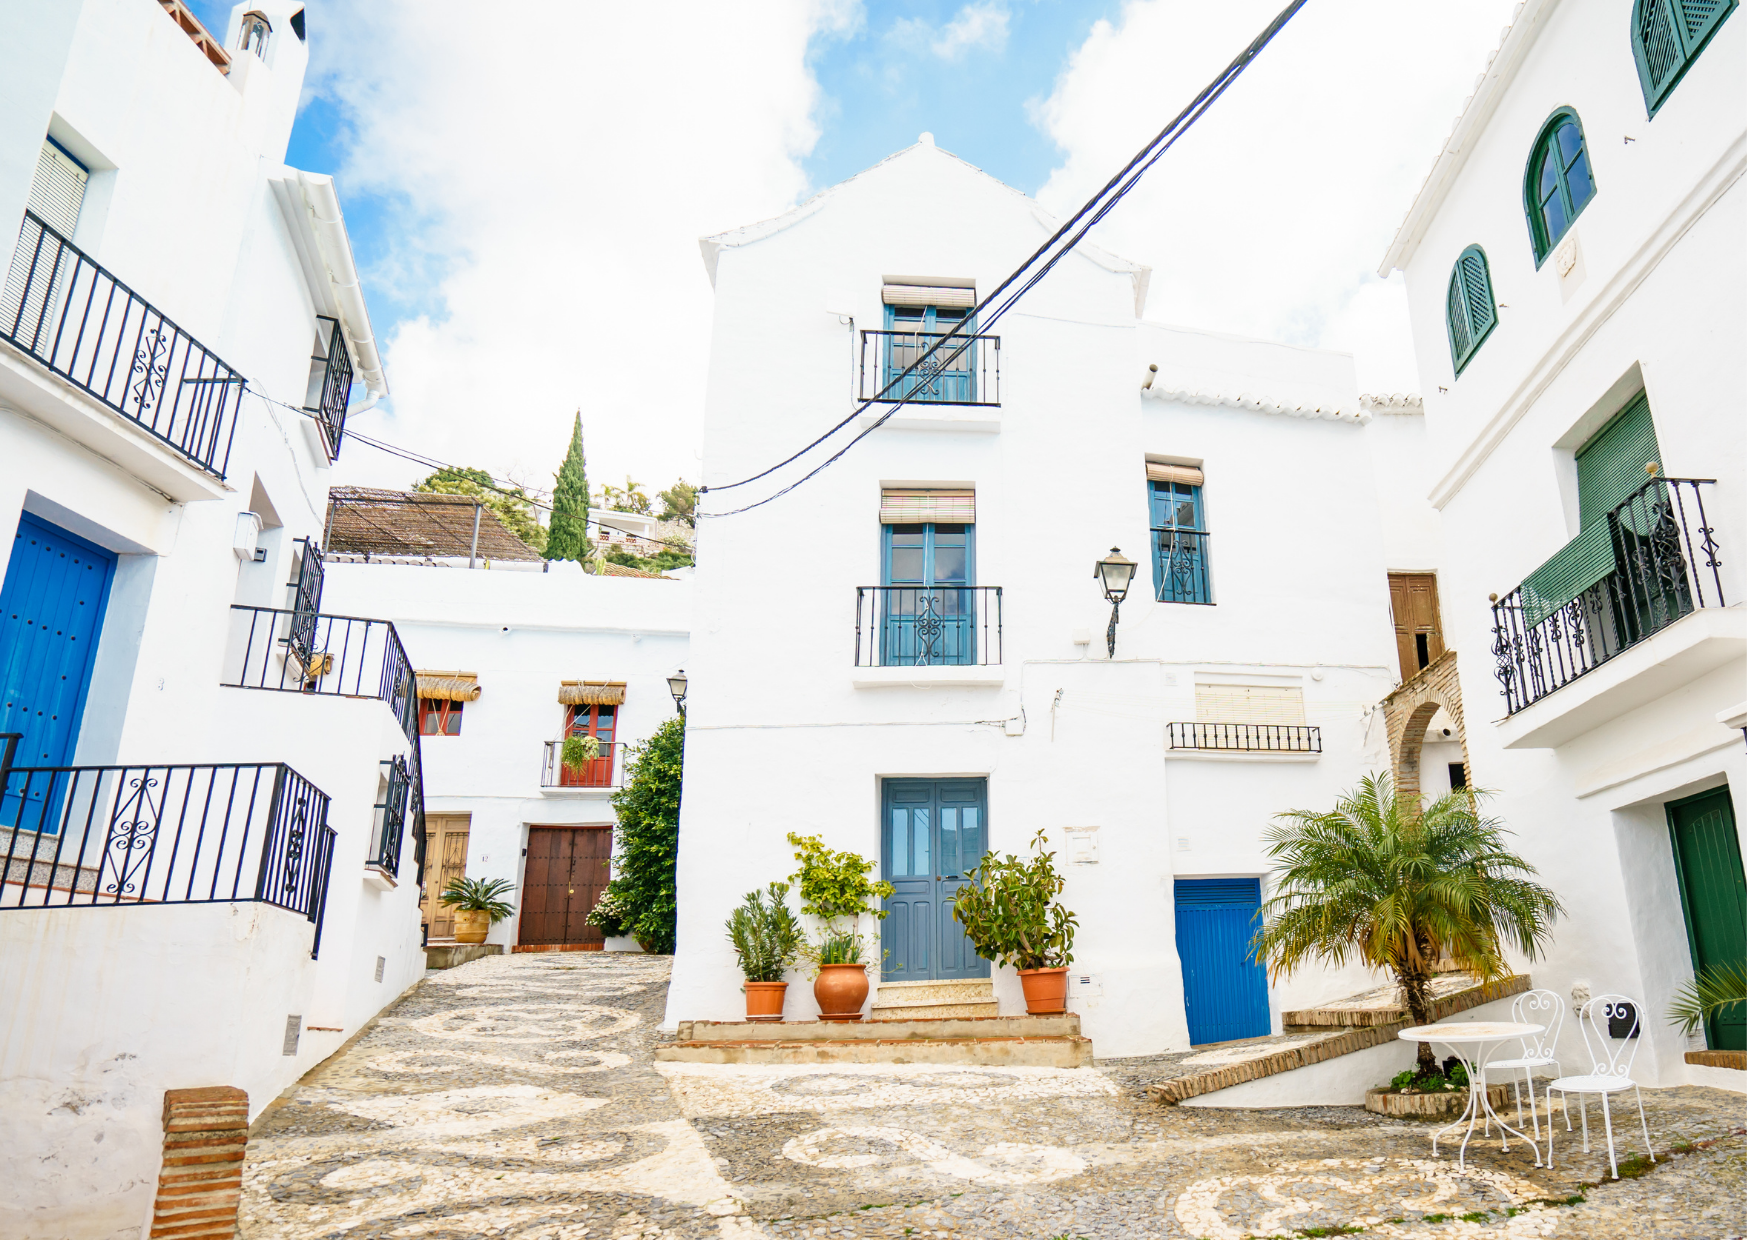 ¿Por qué elegir Málaga como destino para hacer turismo rural?